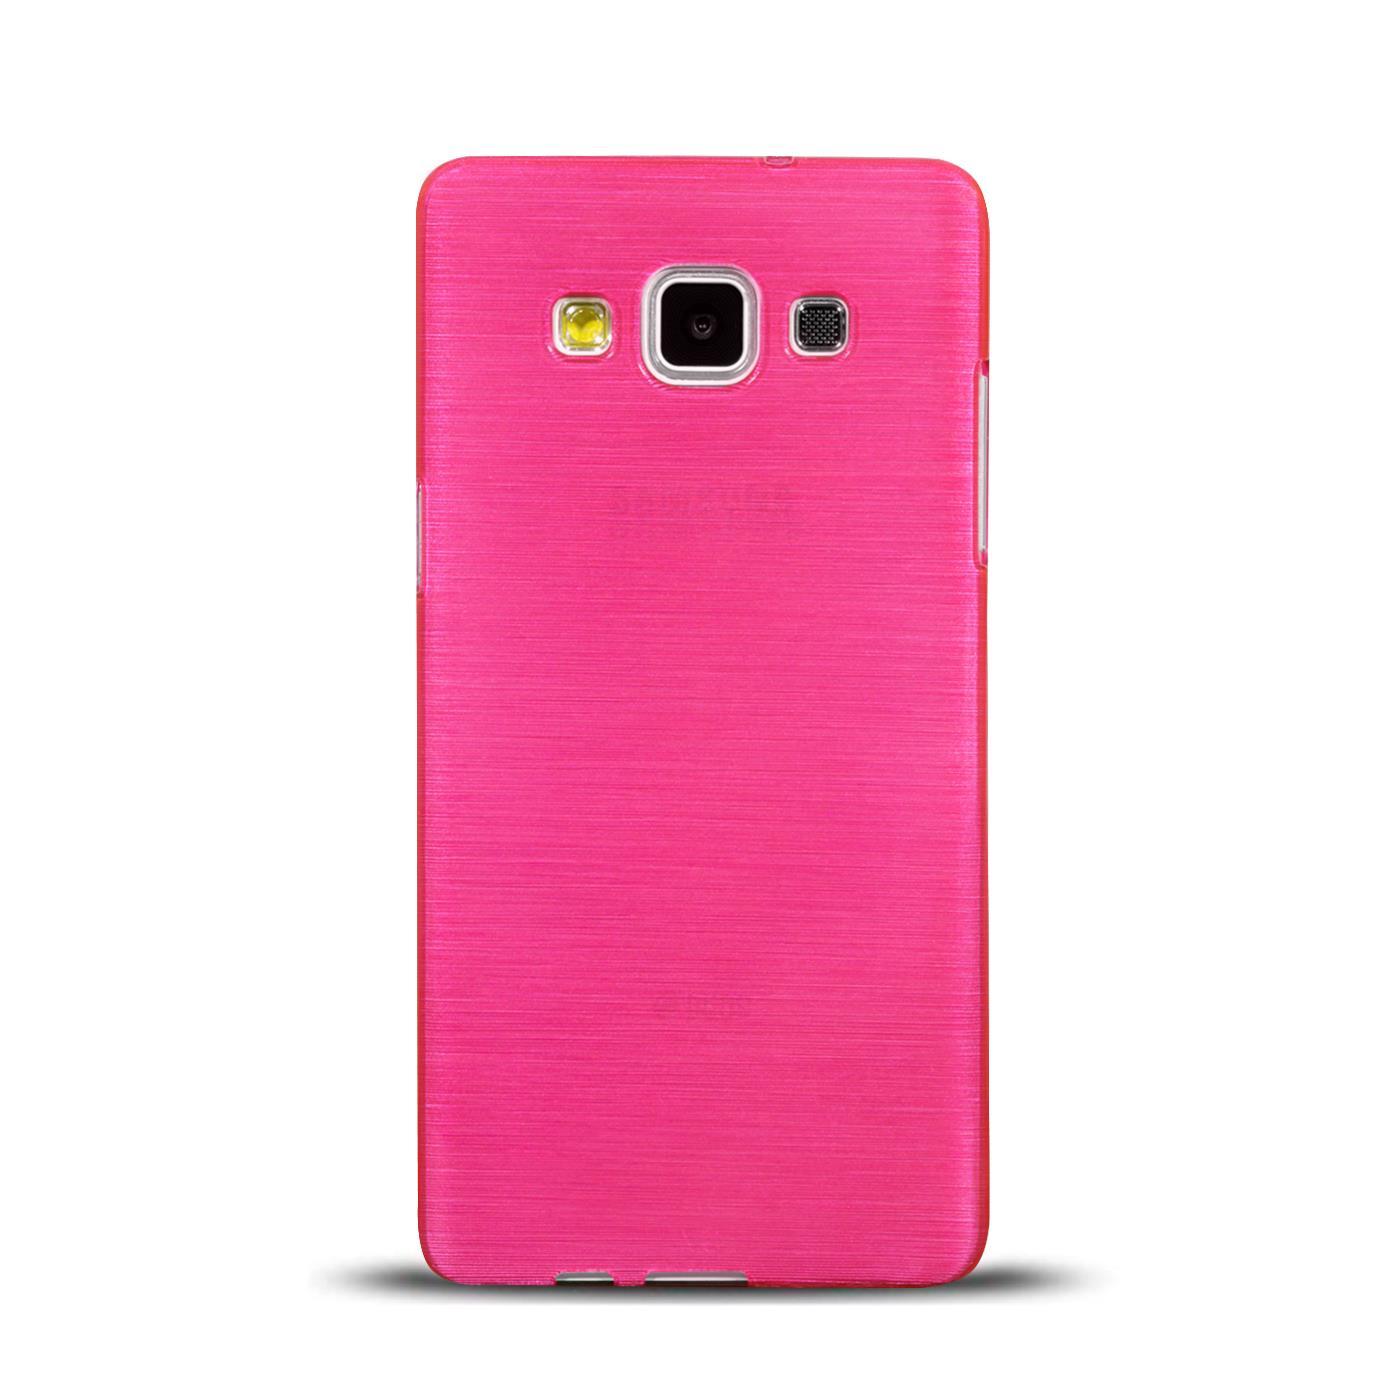 Silikon-Bumper-Case-Samsung-Galaxy-a5-2015-Ultra-Slim-Stossfeste-Rueckschale Indexbild 14